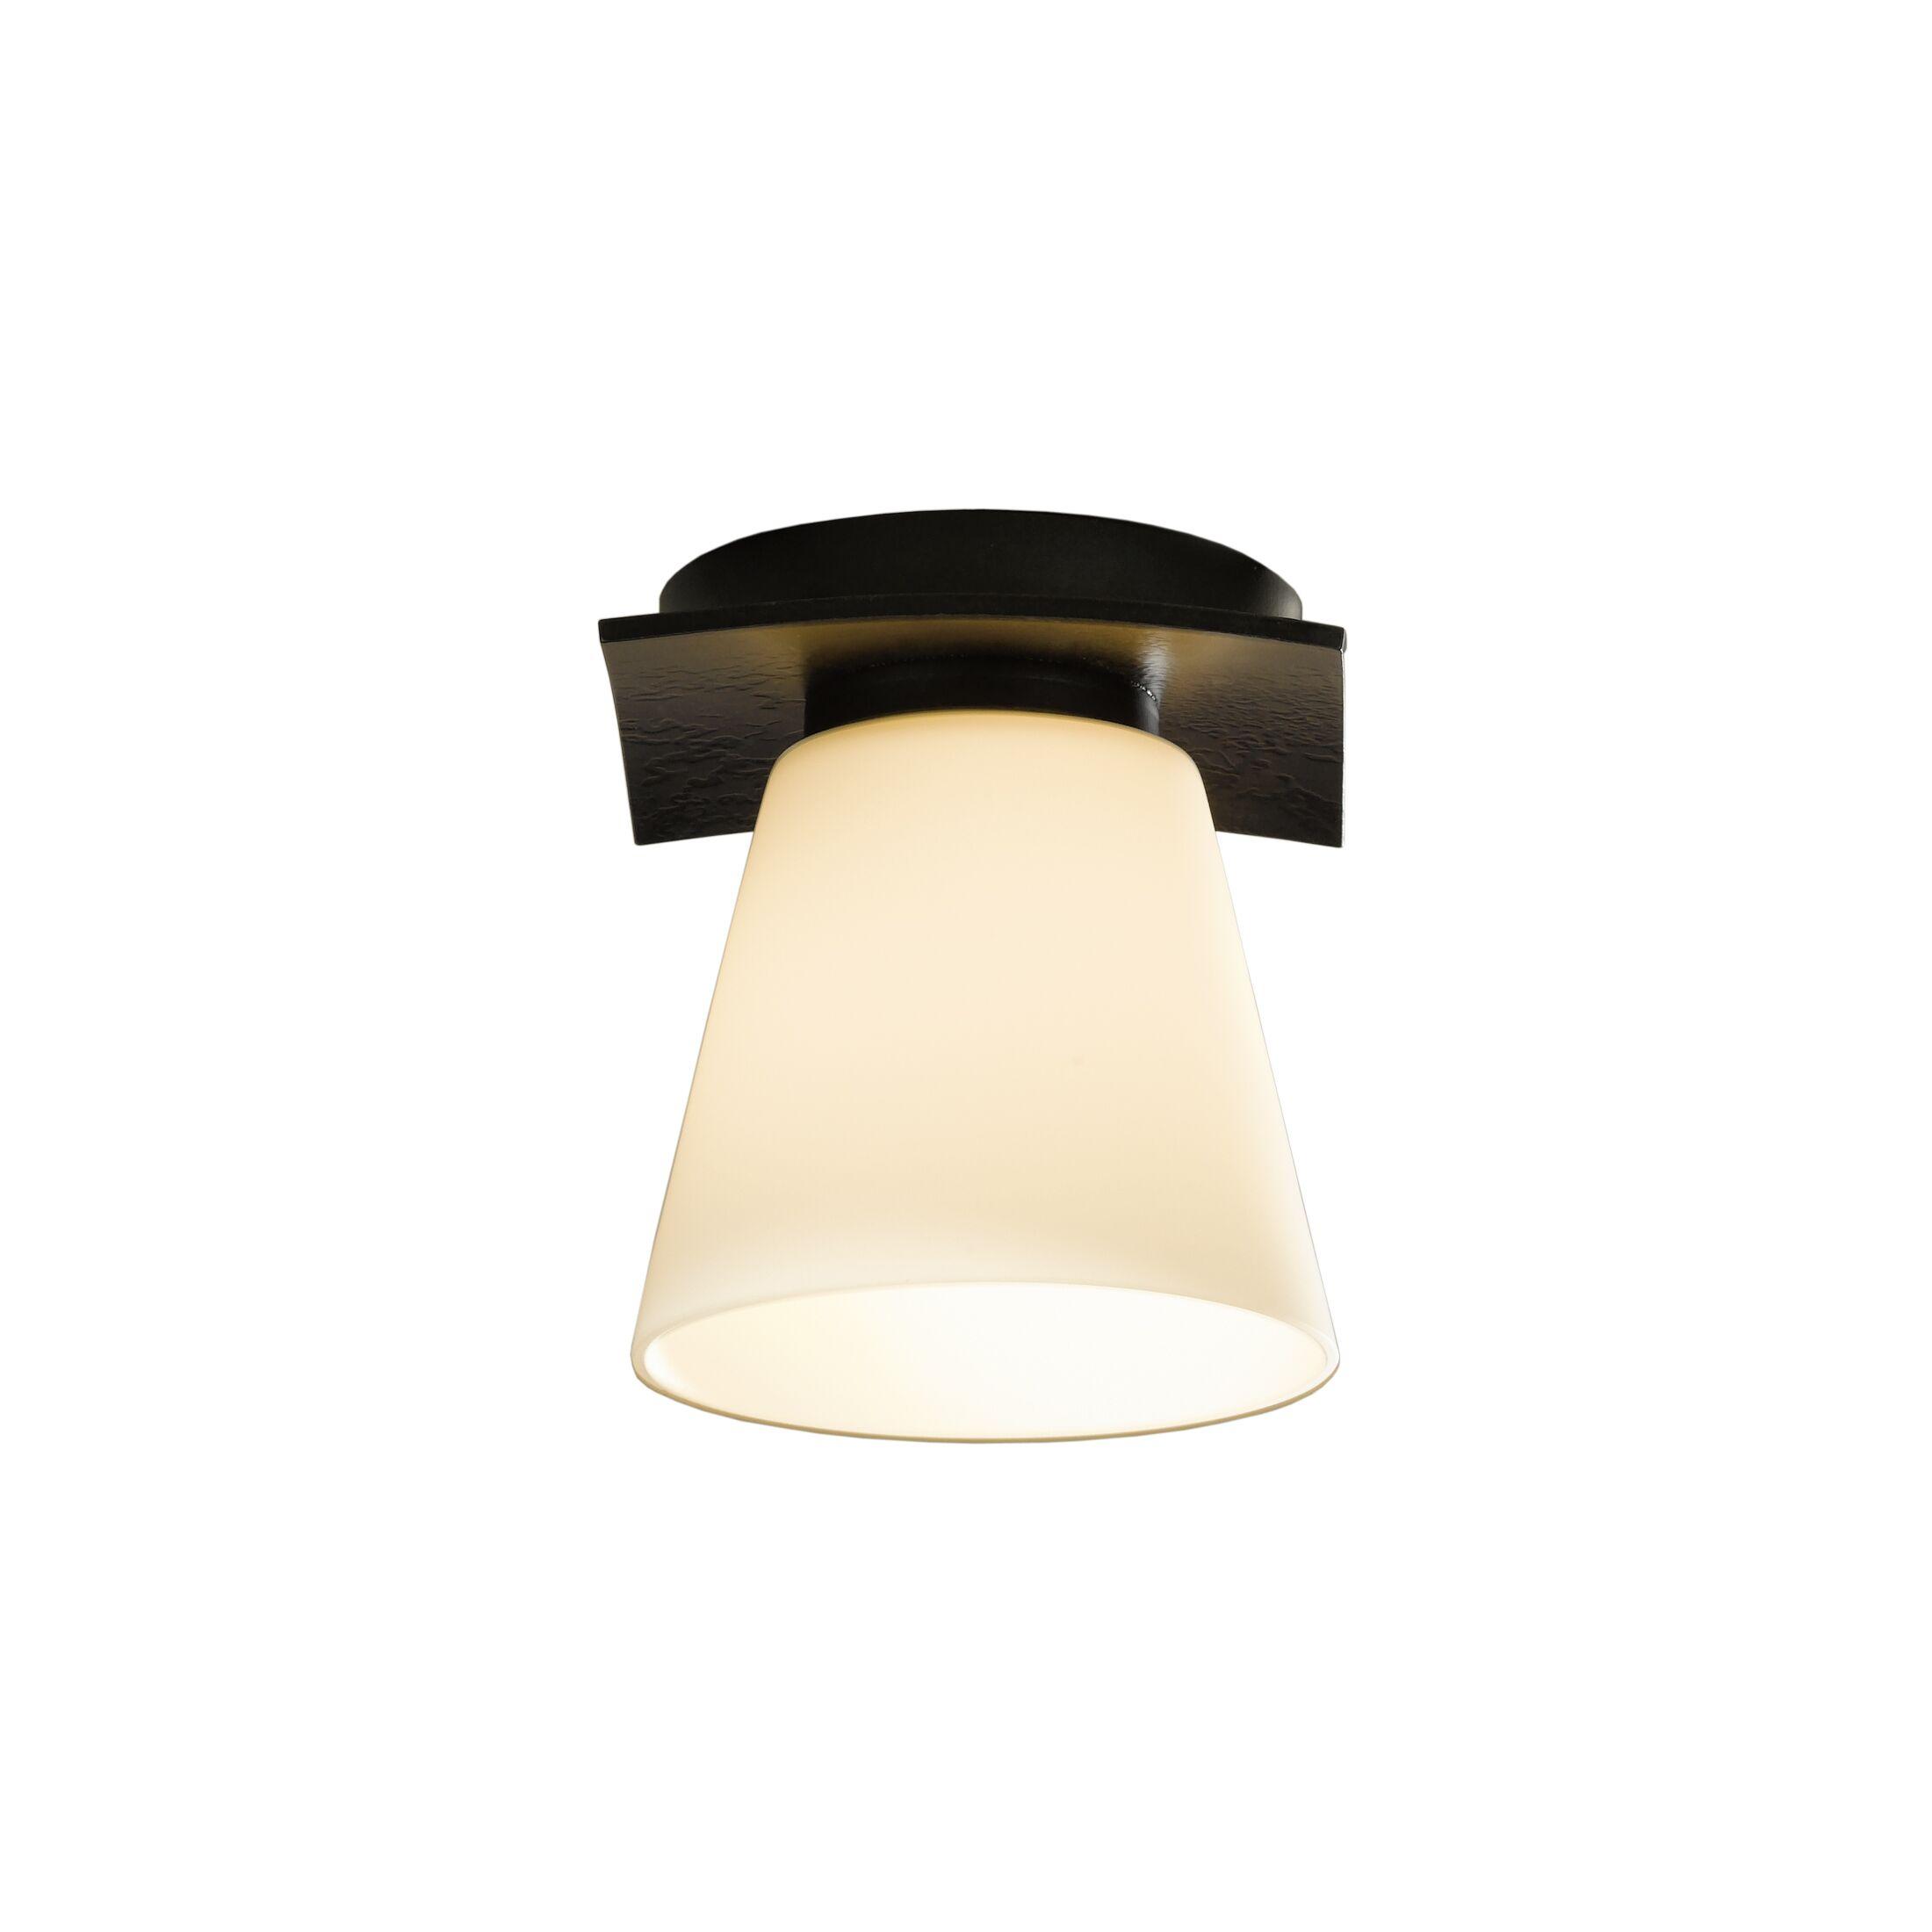 Wren 1-Light Semi Flush Mount Finish: Mahogany, Shade Color: Opal, Bulb Type: (1) 60W fluorescent bulb